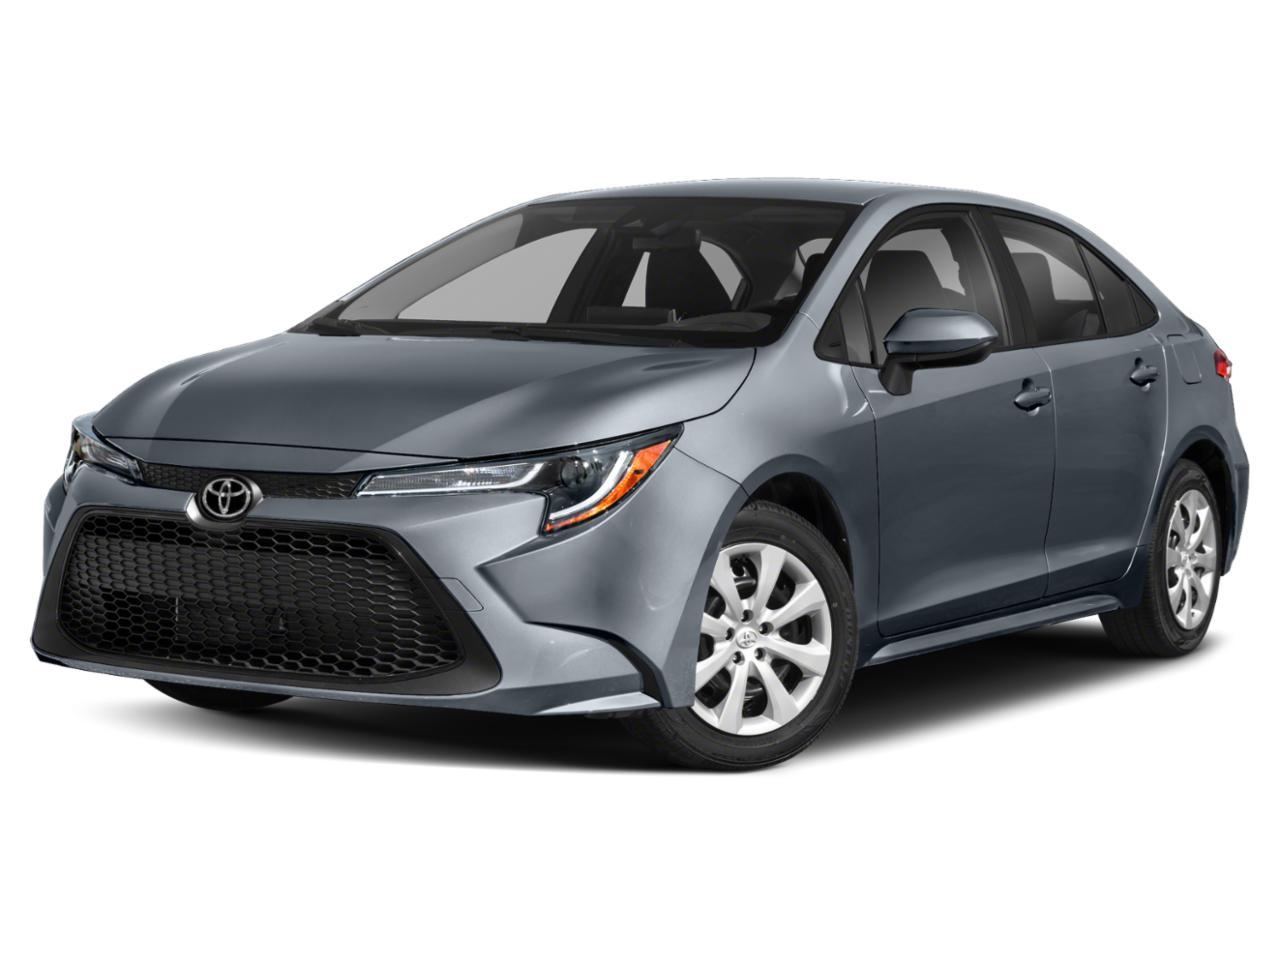 2020 Toyota Corolla Vehicle Photo in COLORADO SPRINGS, CO 80905-7347